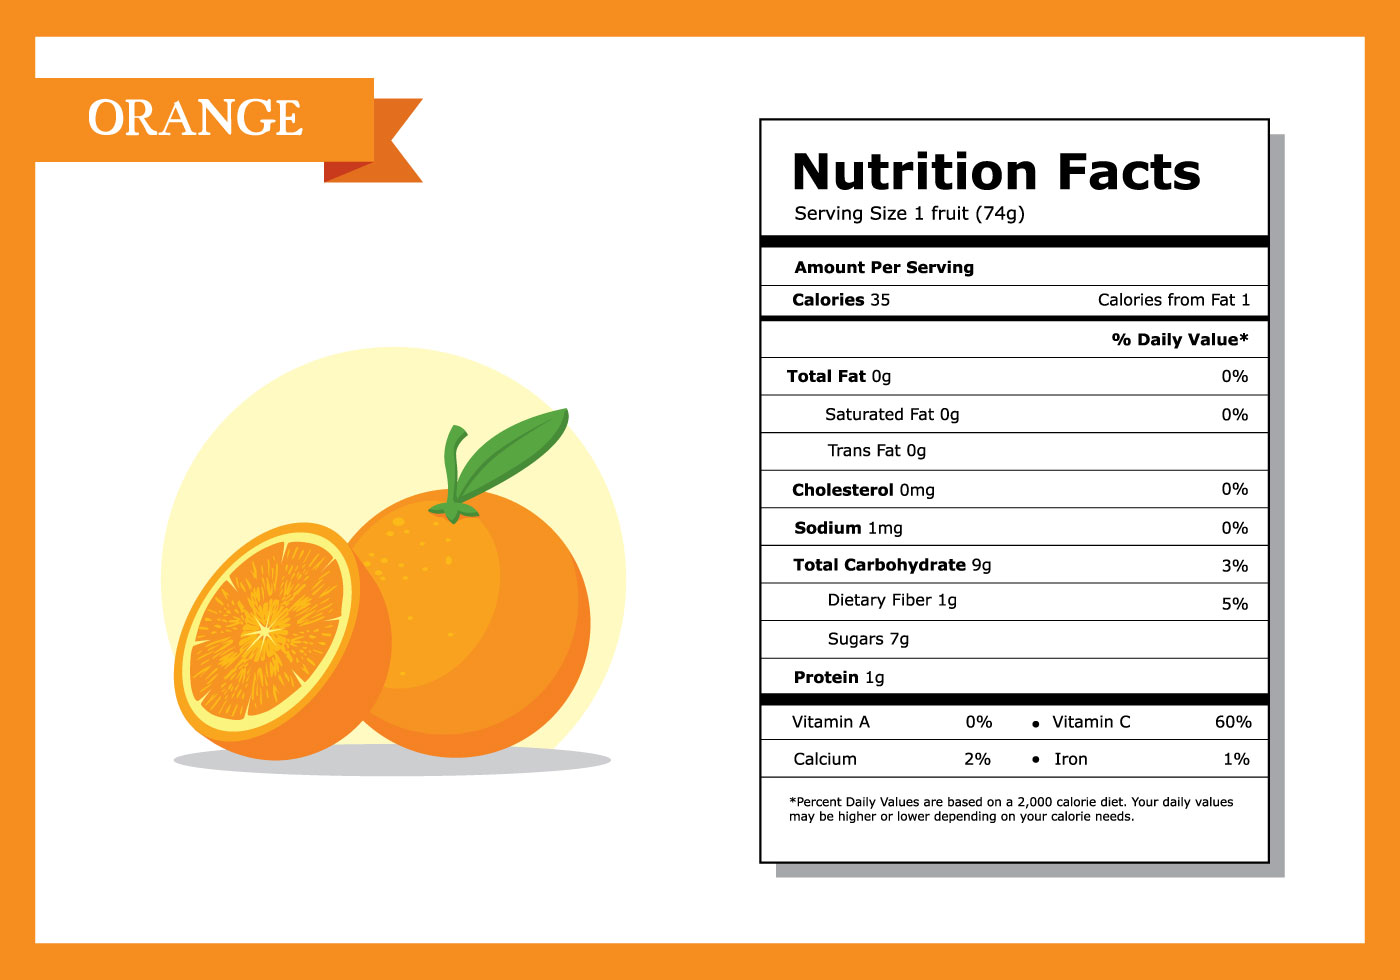 orange nutrition facts vector - download free vector art, stock